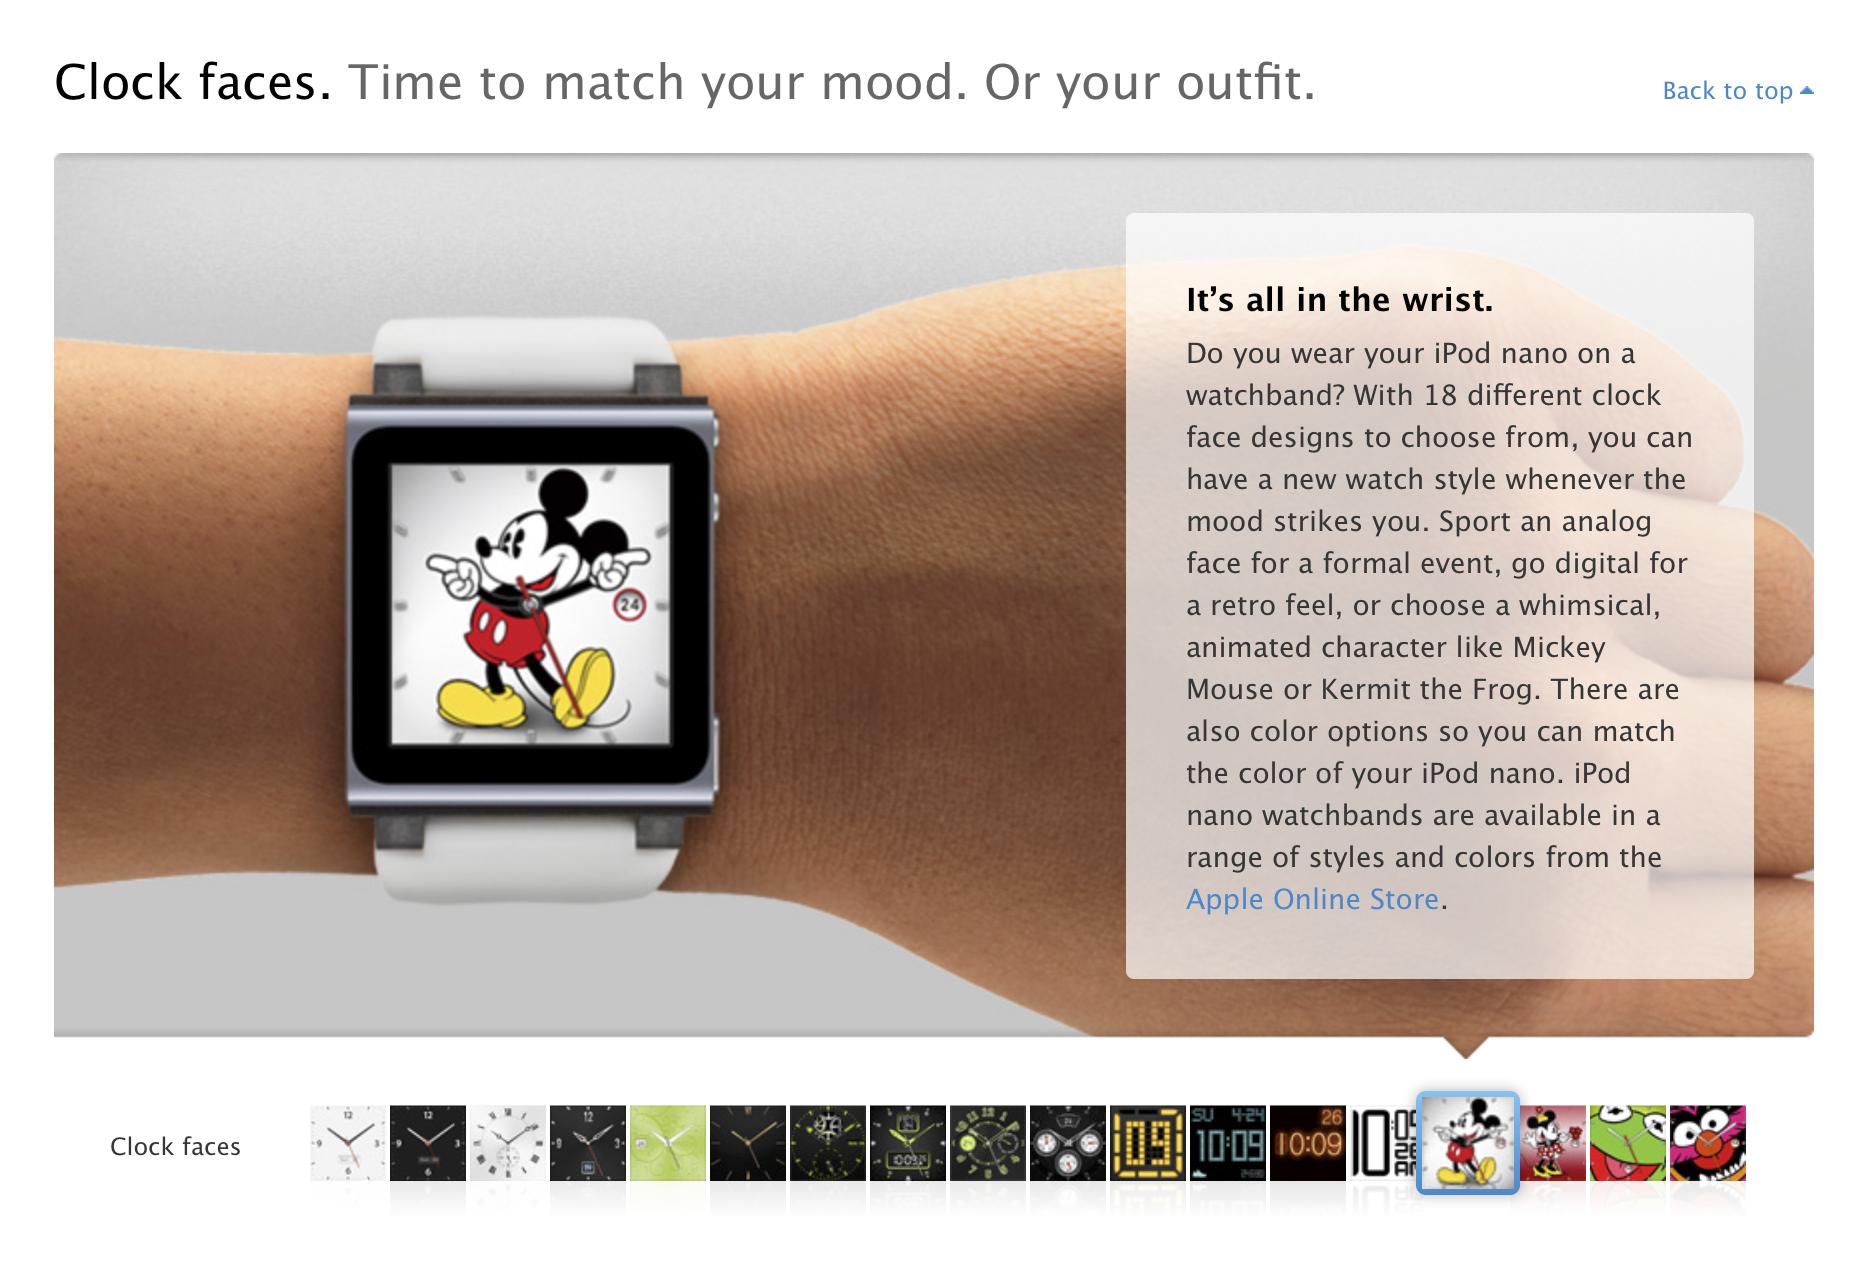 apple-ipad-watch